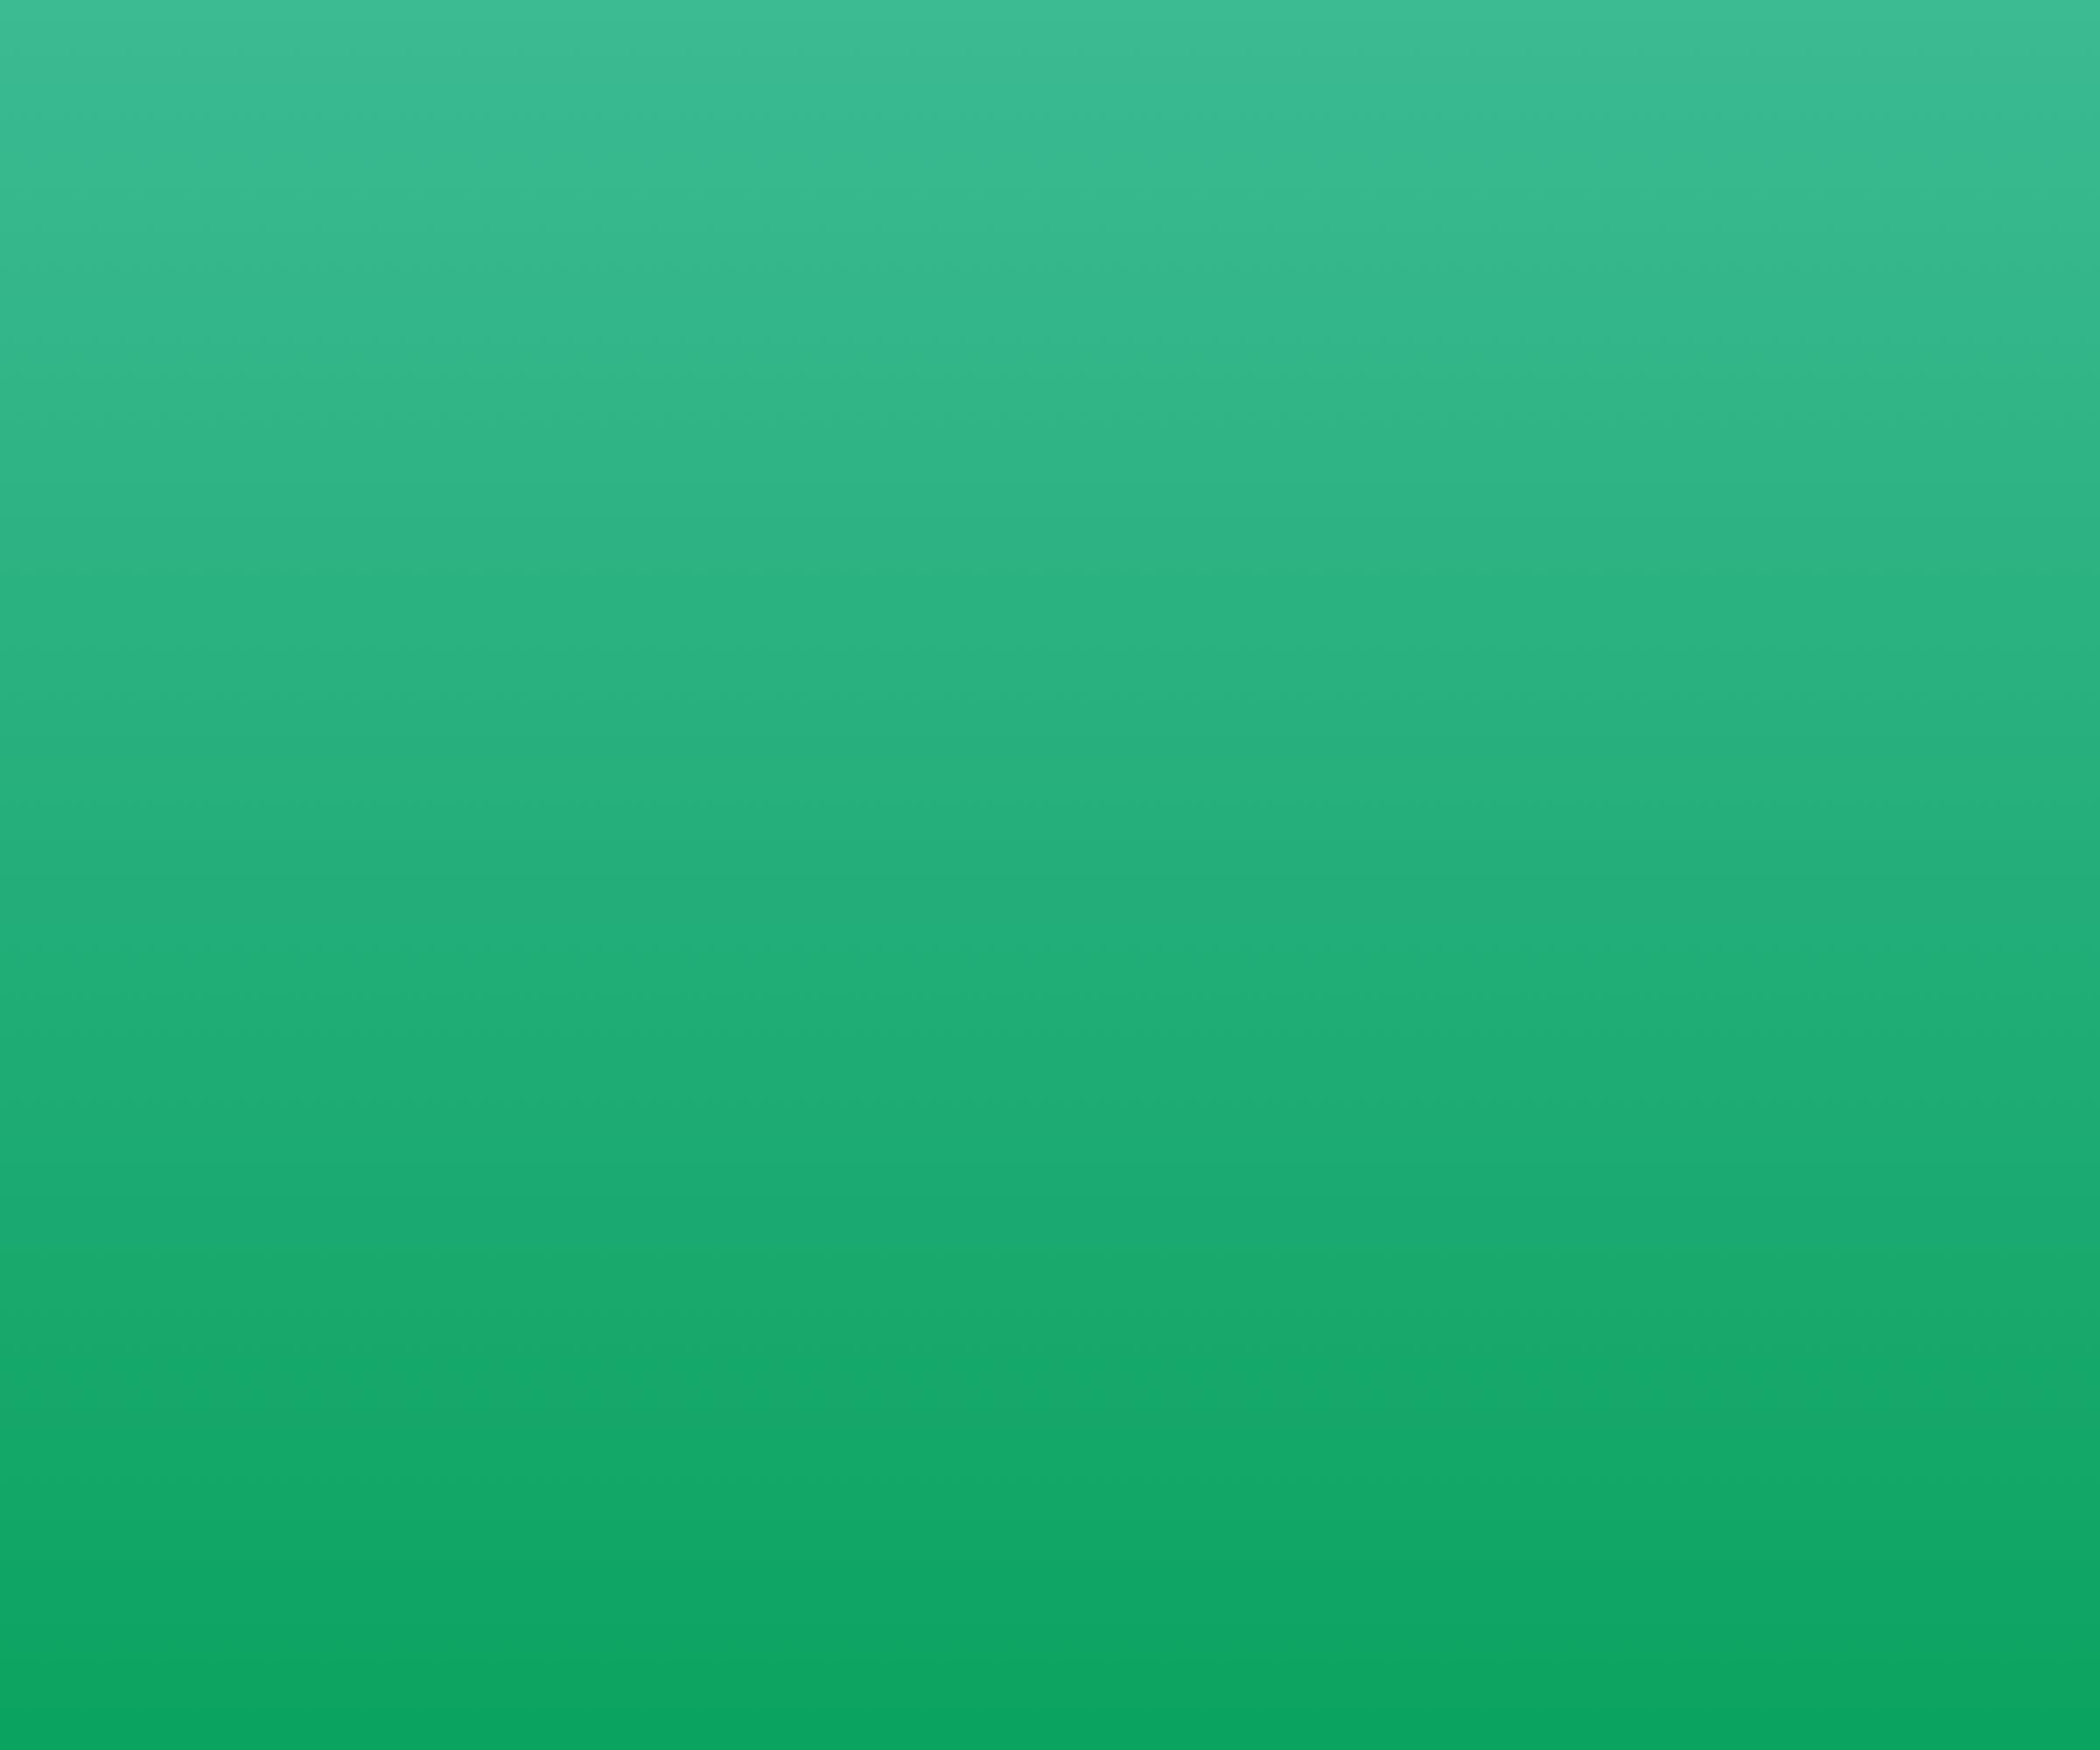 Fresh Background Gradients | WebGradients.com 💎